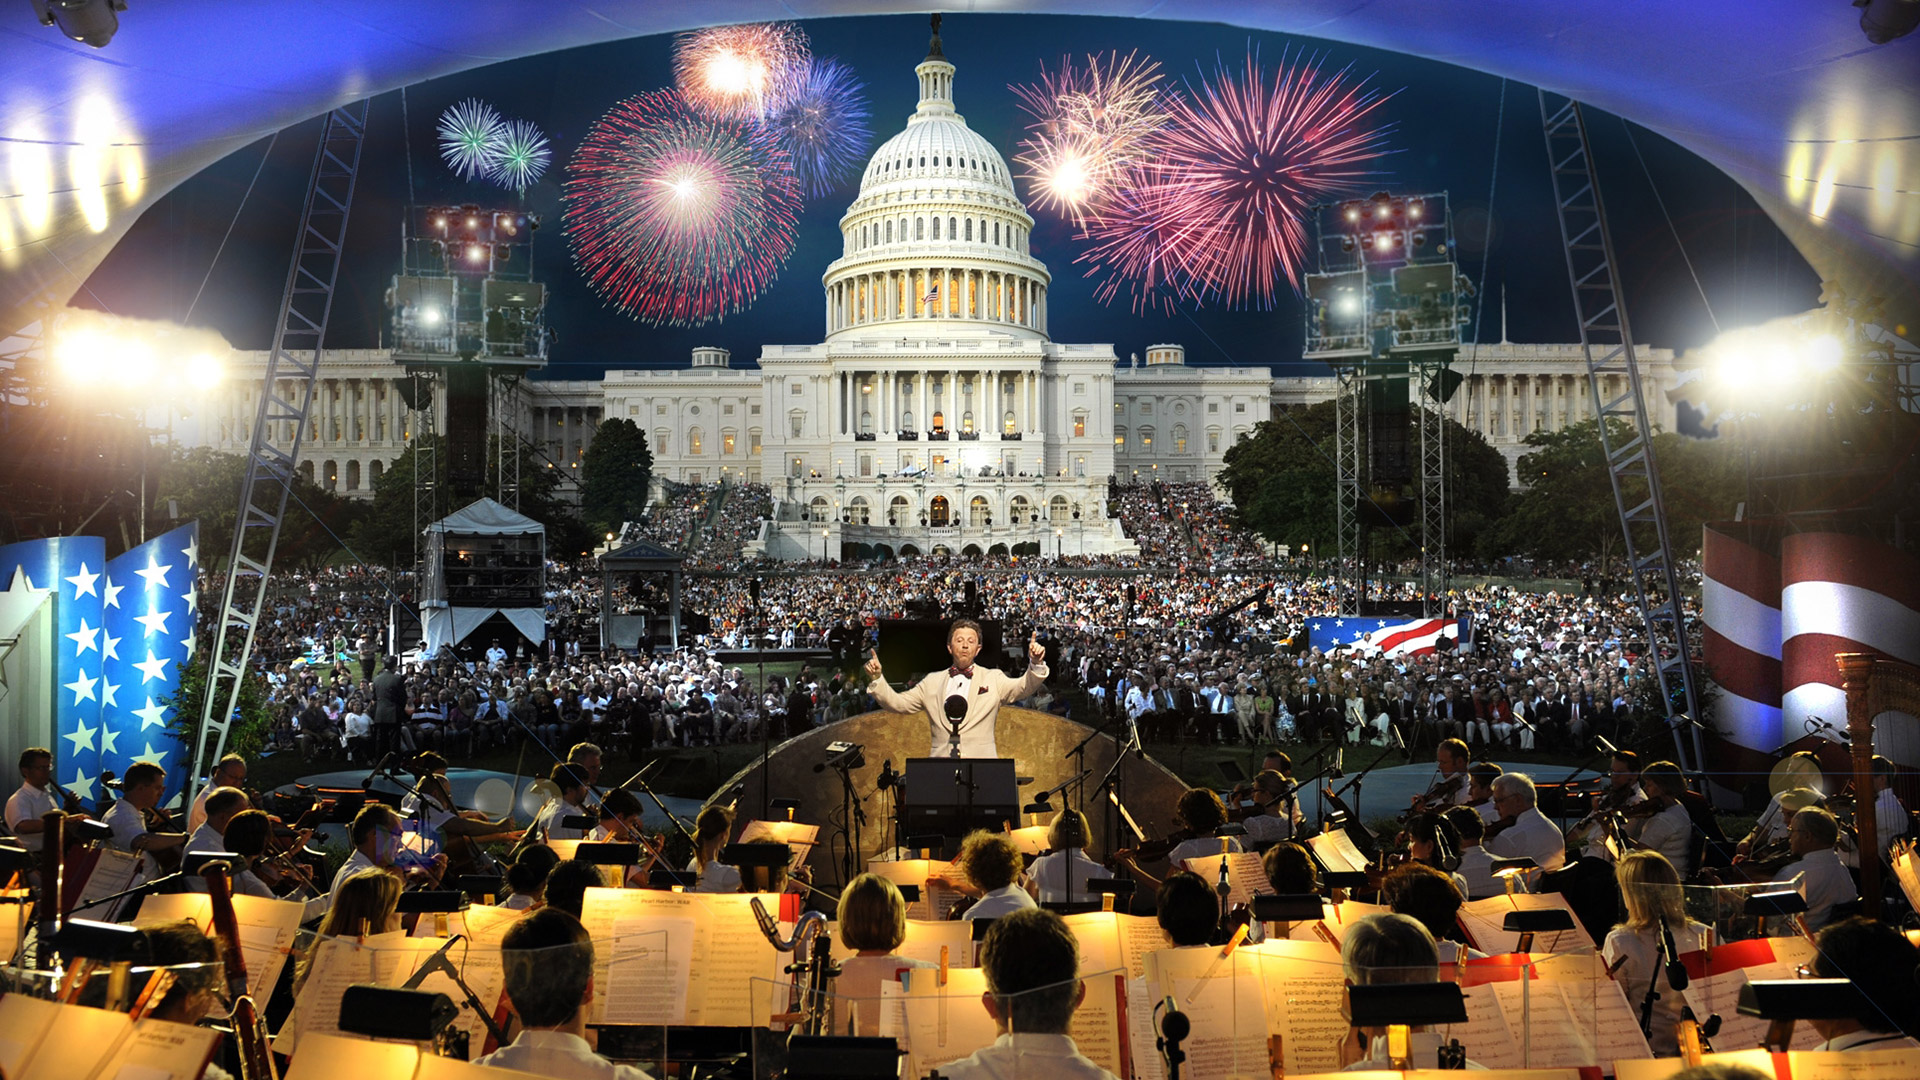 Capitol 4th of July concert, Washington DC, USA